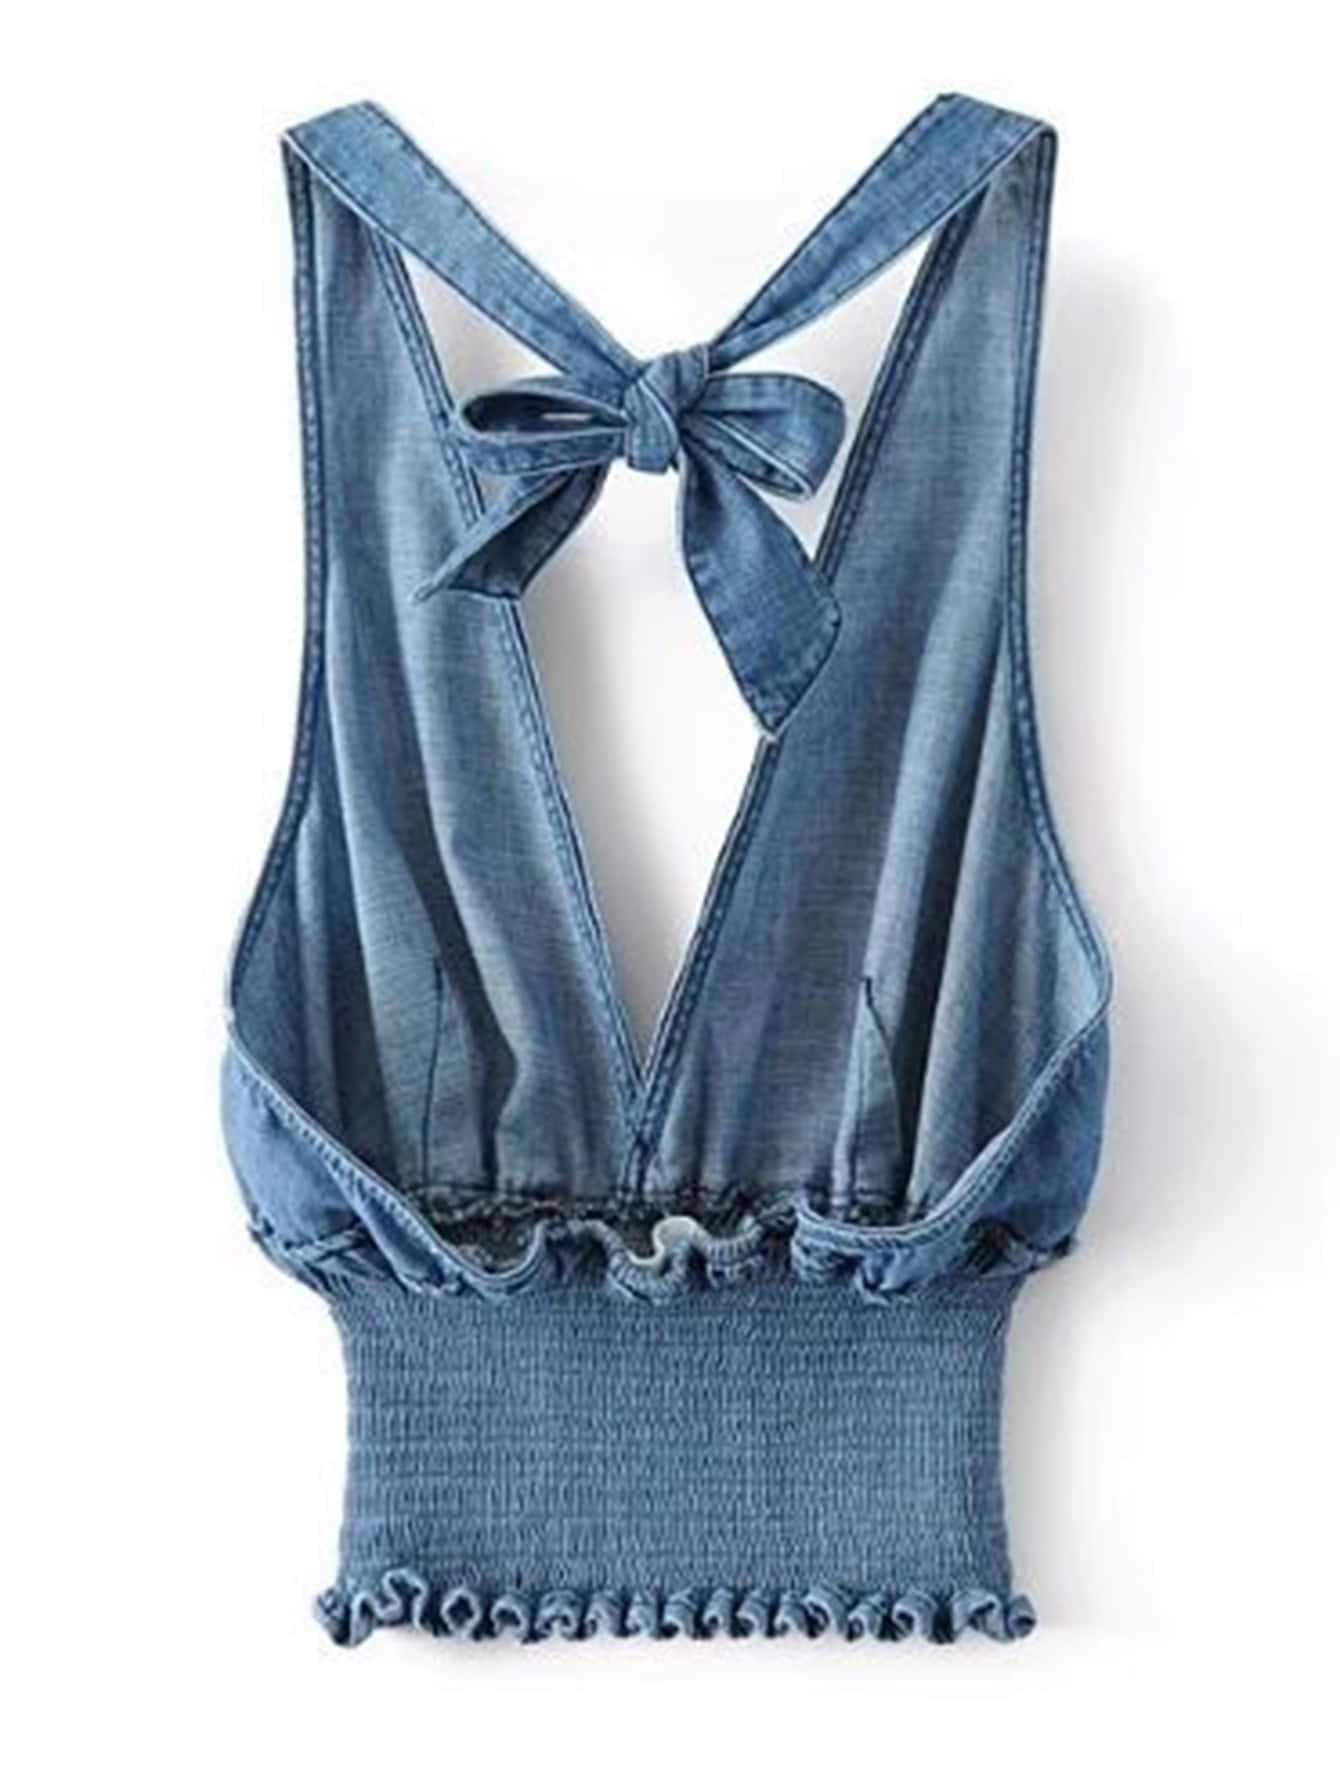 blouse170510205_2